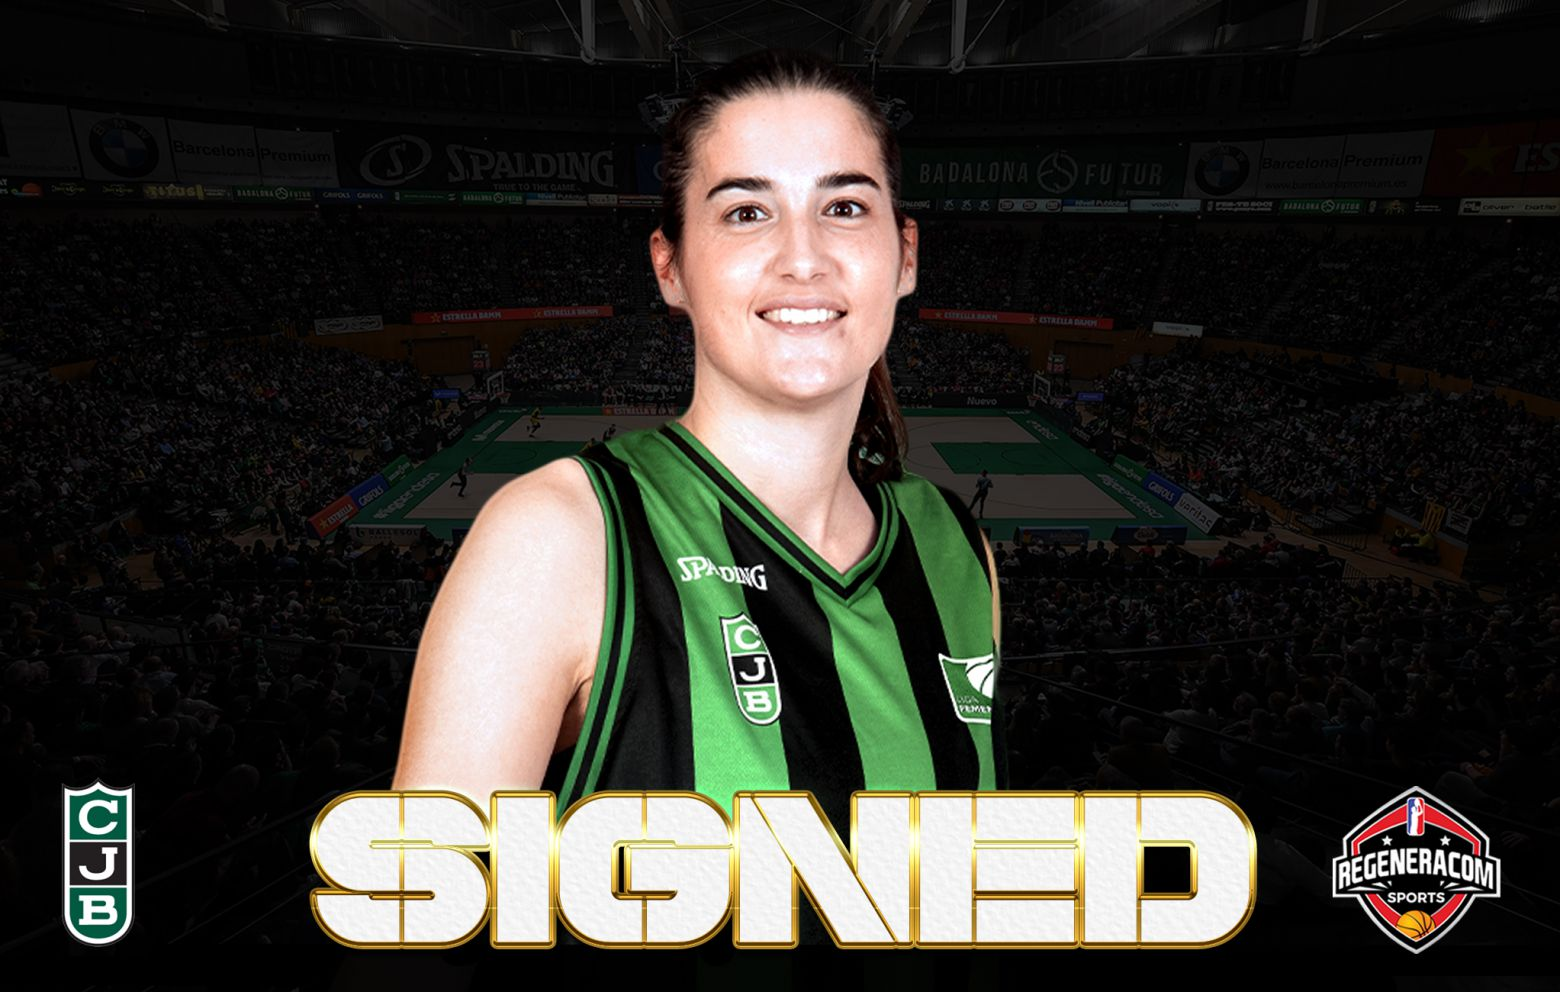 MIREIA VILA has signed with Joventut Badalona for the 2021/22 season